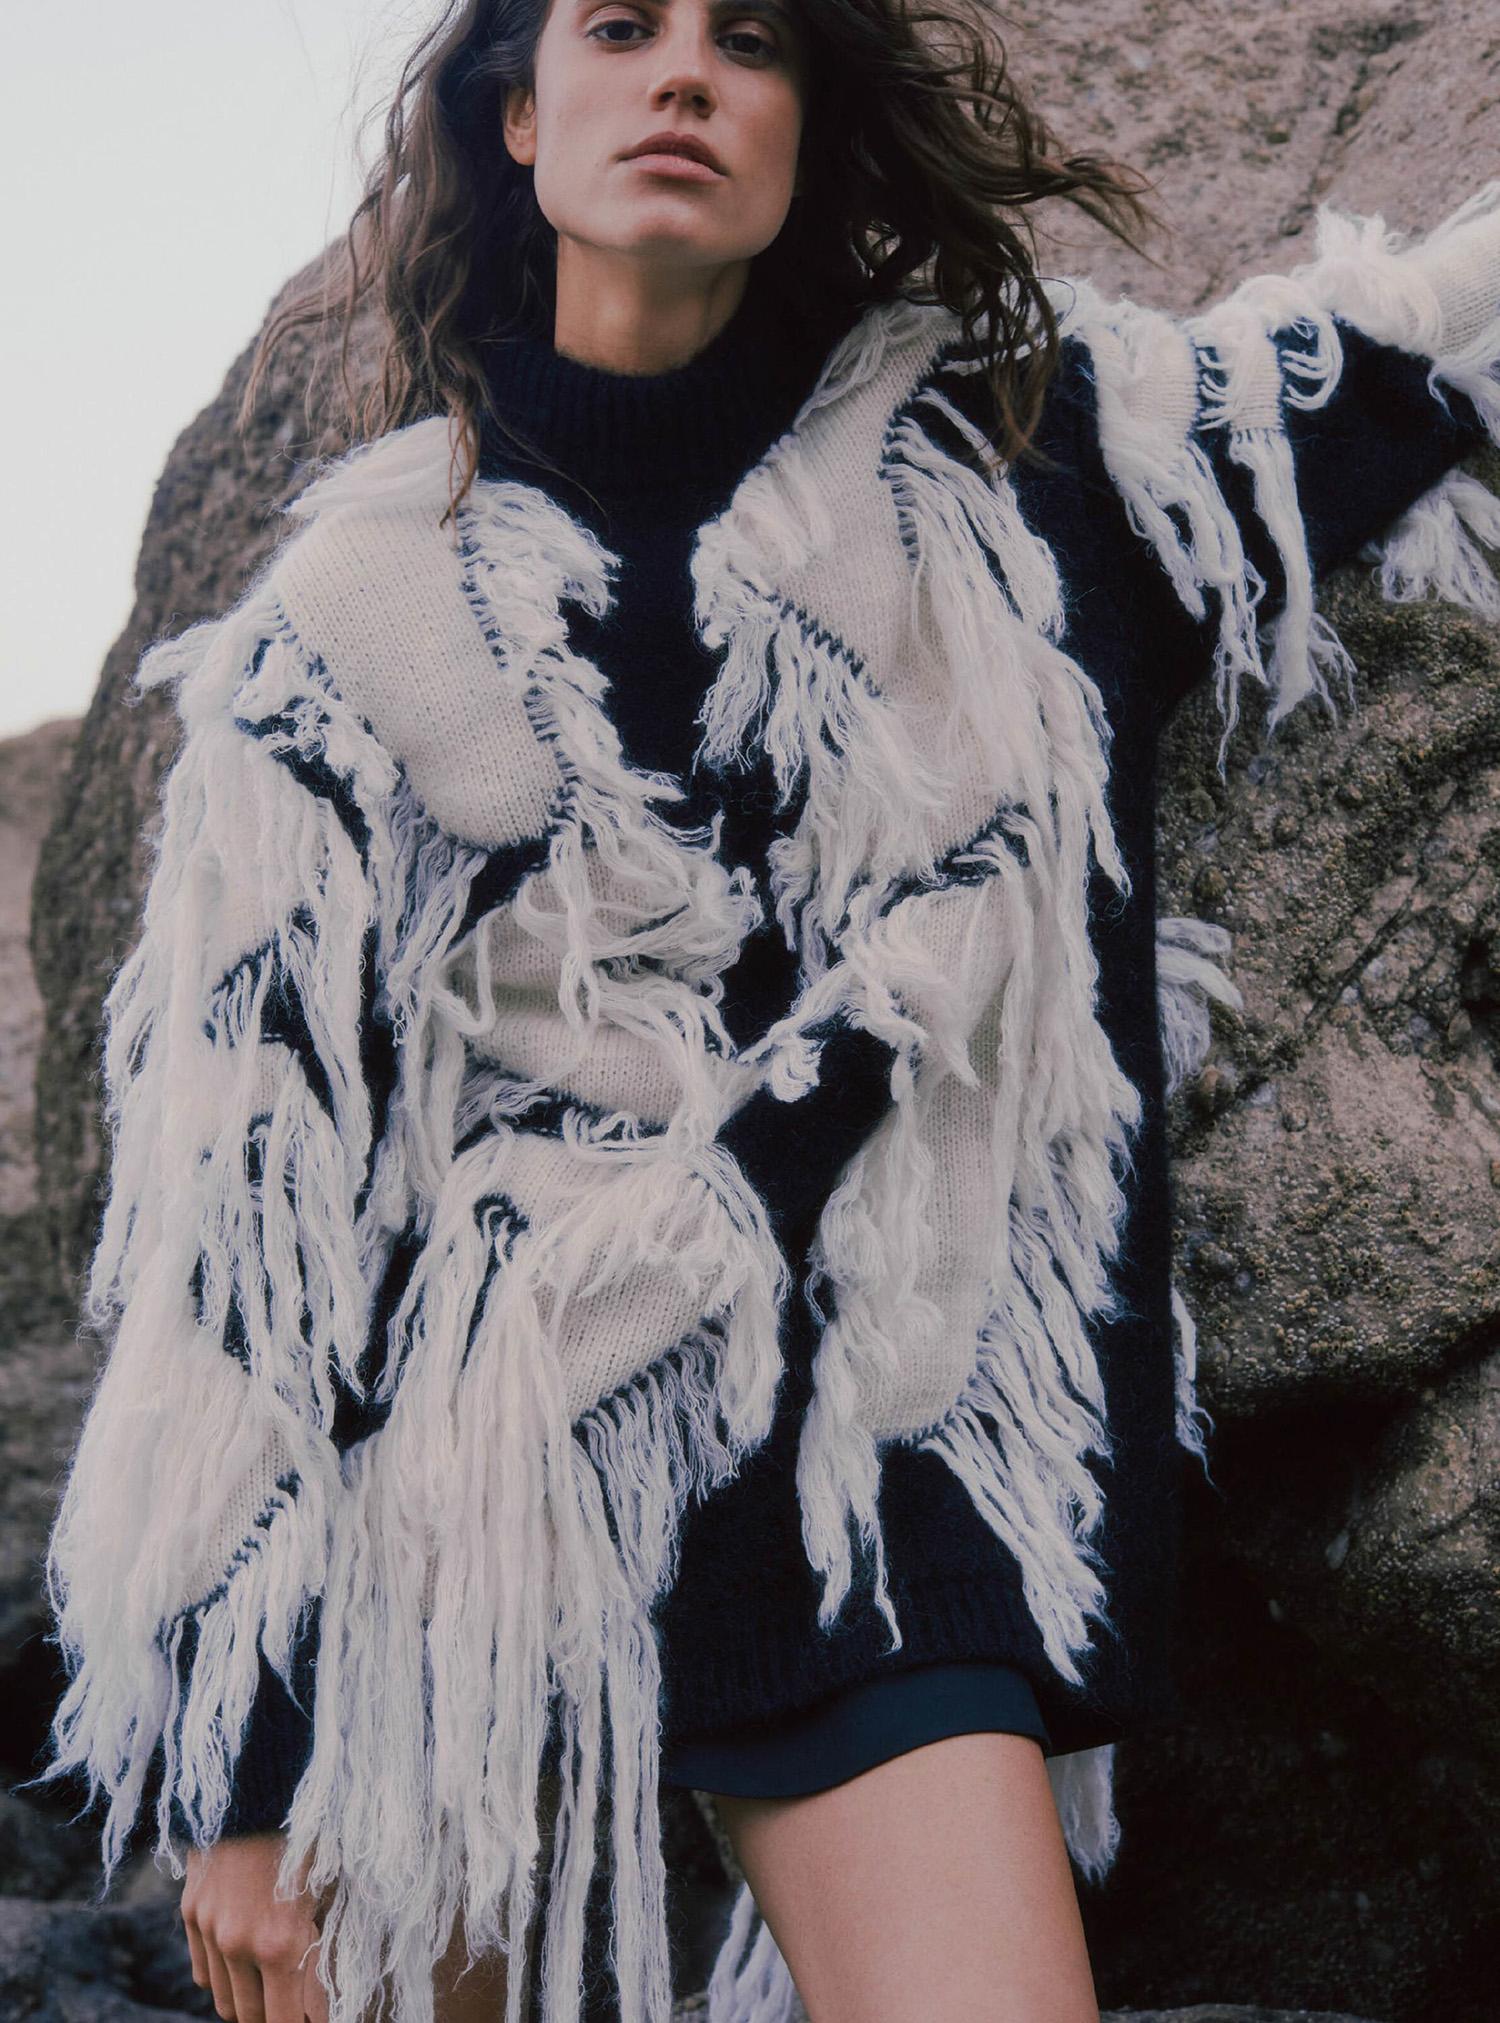 Antonina Petkovic by Agata Popieszynska for Harper's Bazaar UK October 2021